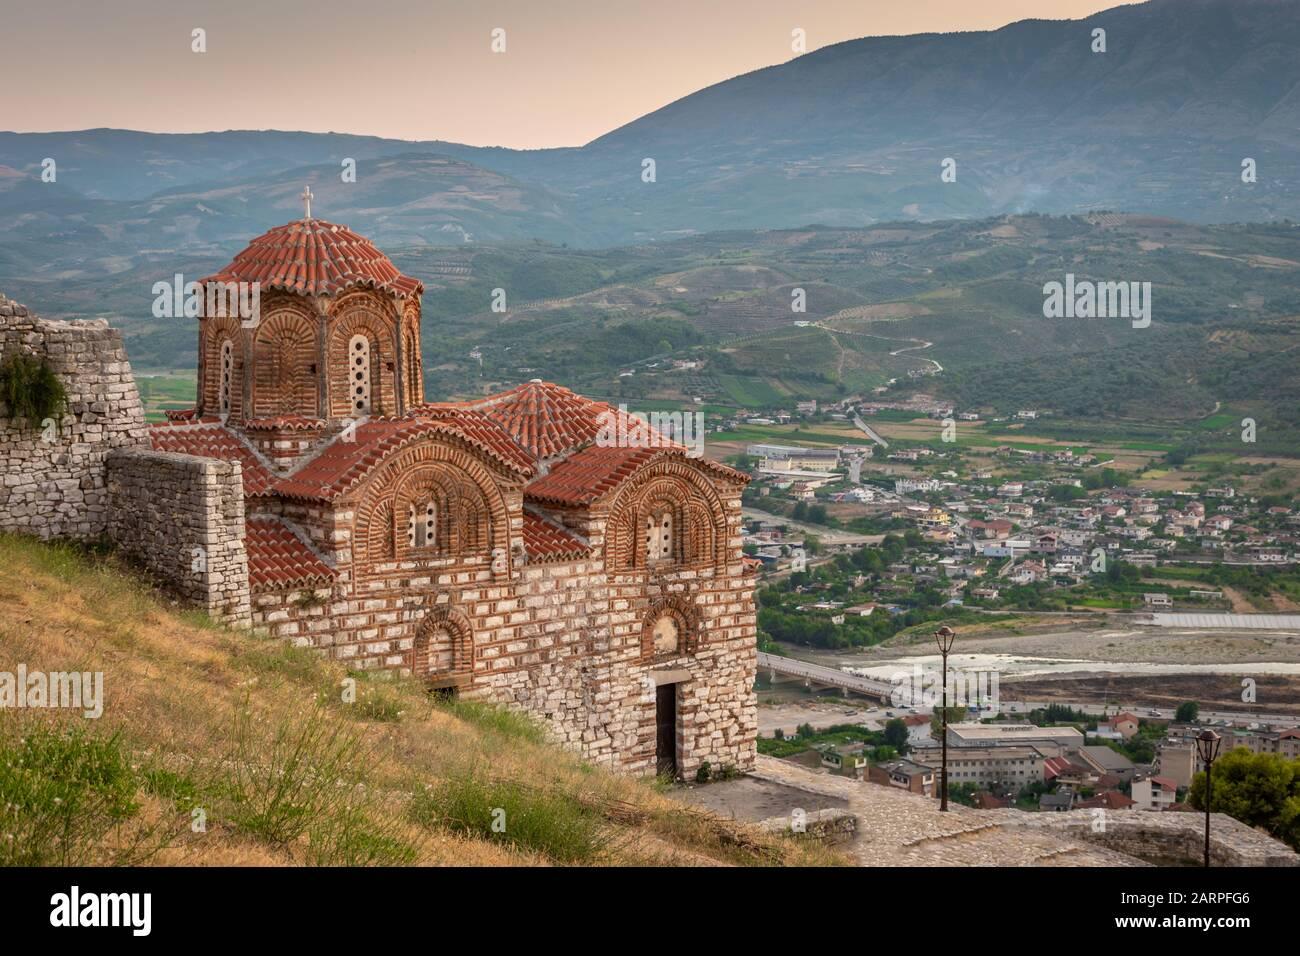 Byzantine church on the hilltop, Berat, Albania Stock Photo